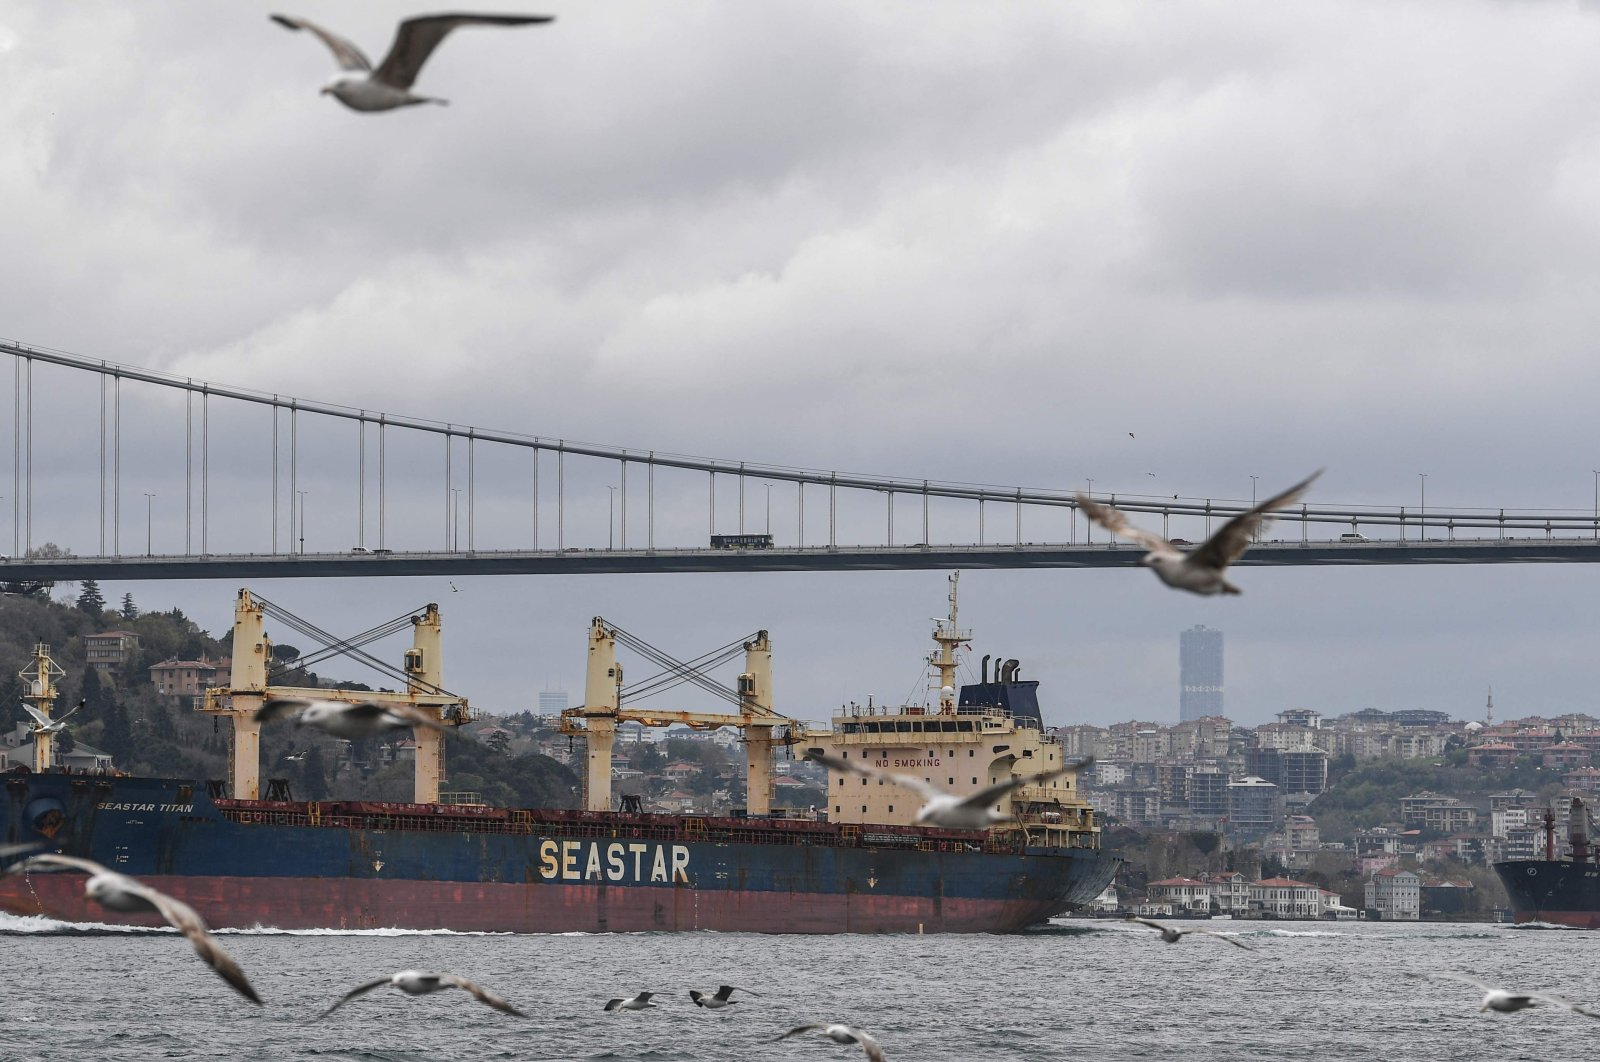 A ship en route to the Black Sea sails through the Bosporus, Istanbul, Turkey, April 23, 2021. (AFP Photo)